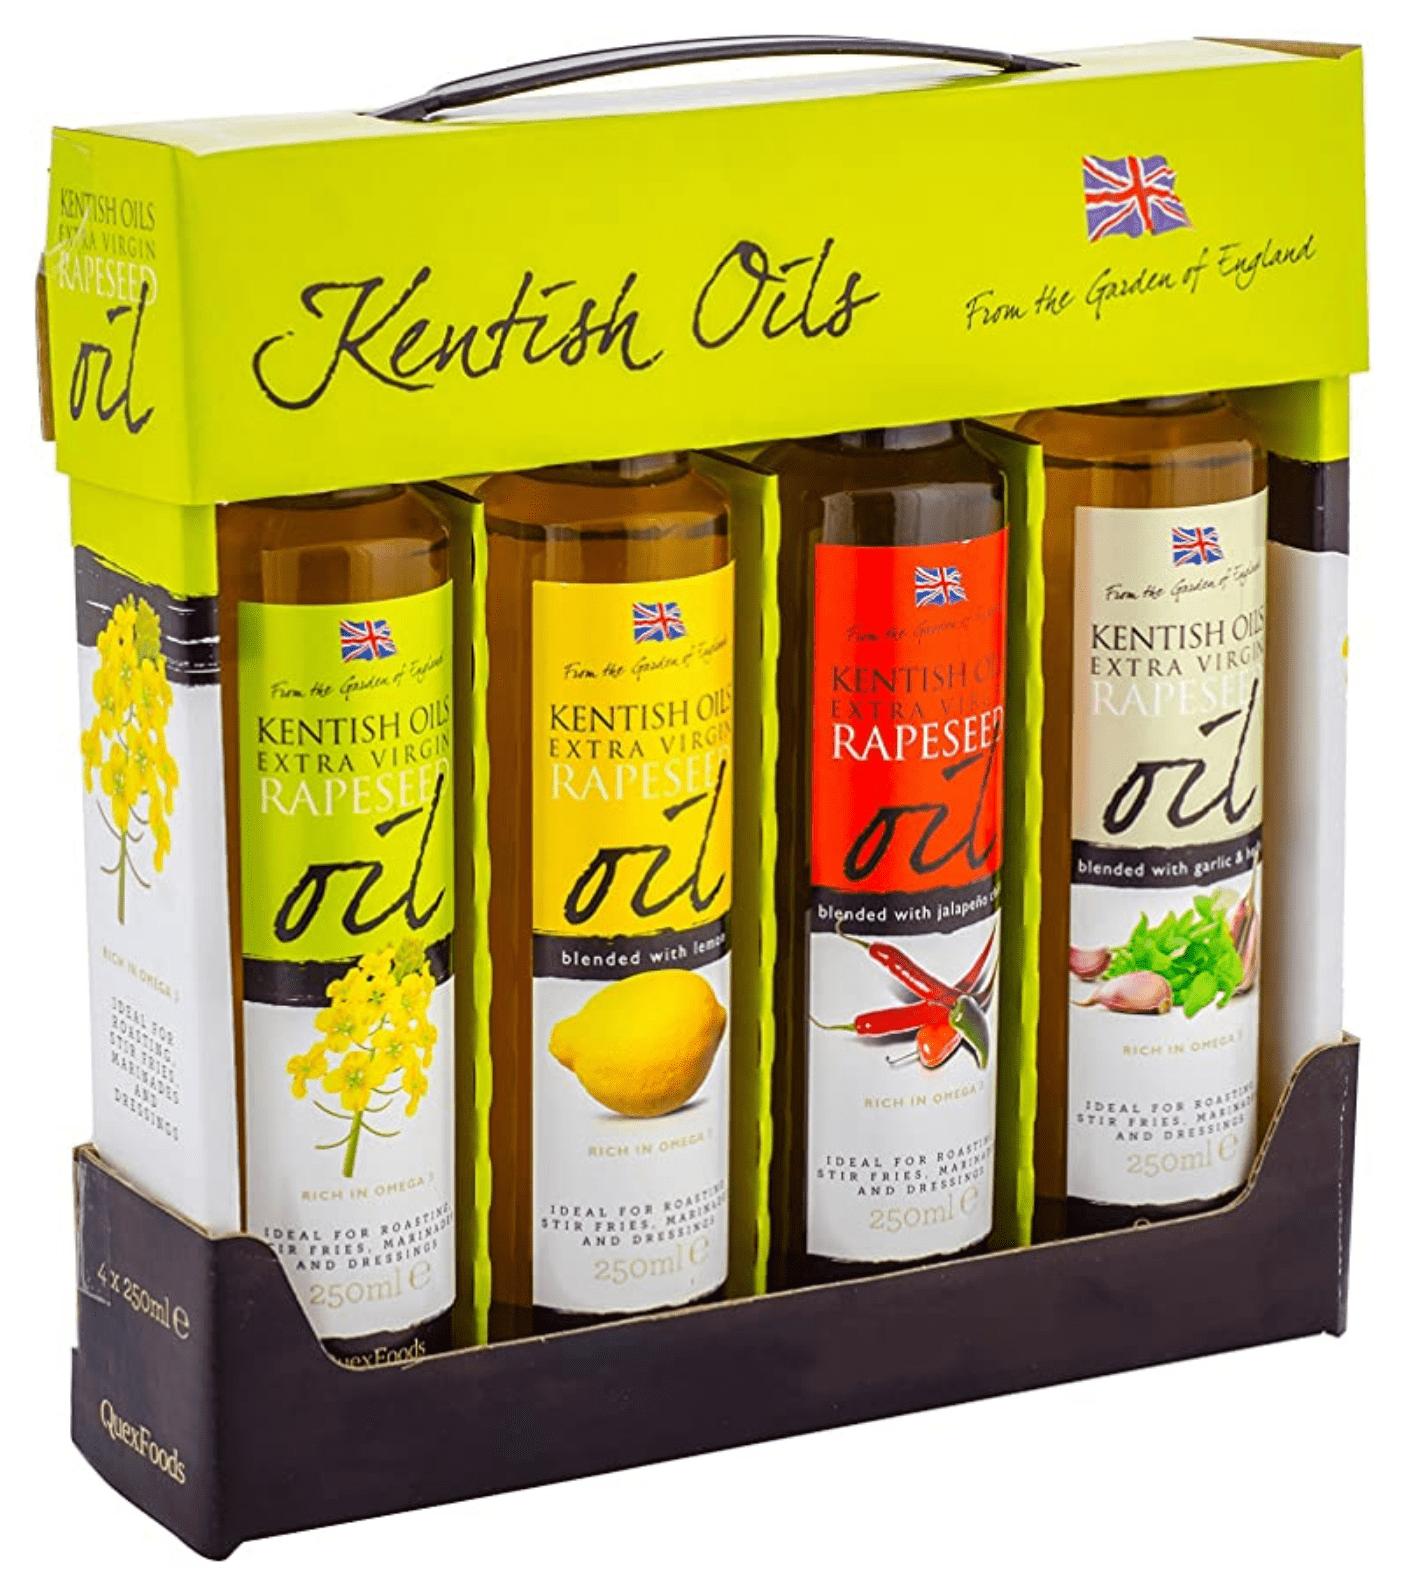 Kentish Oils Presentation gift set